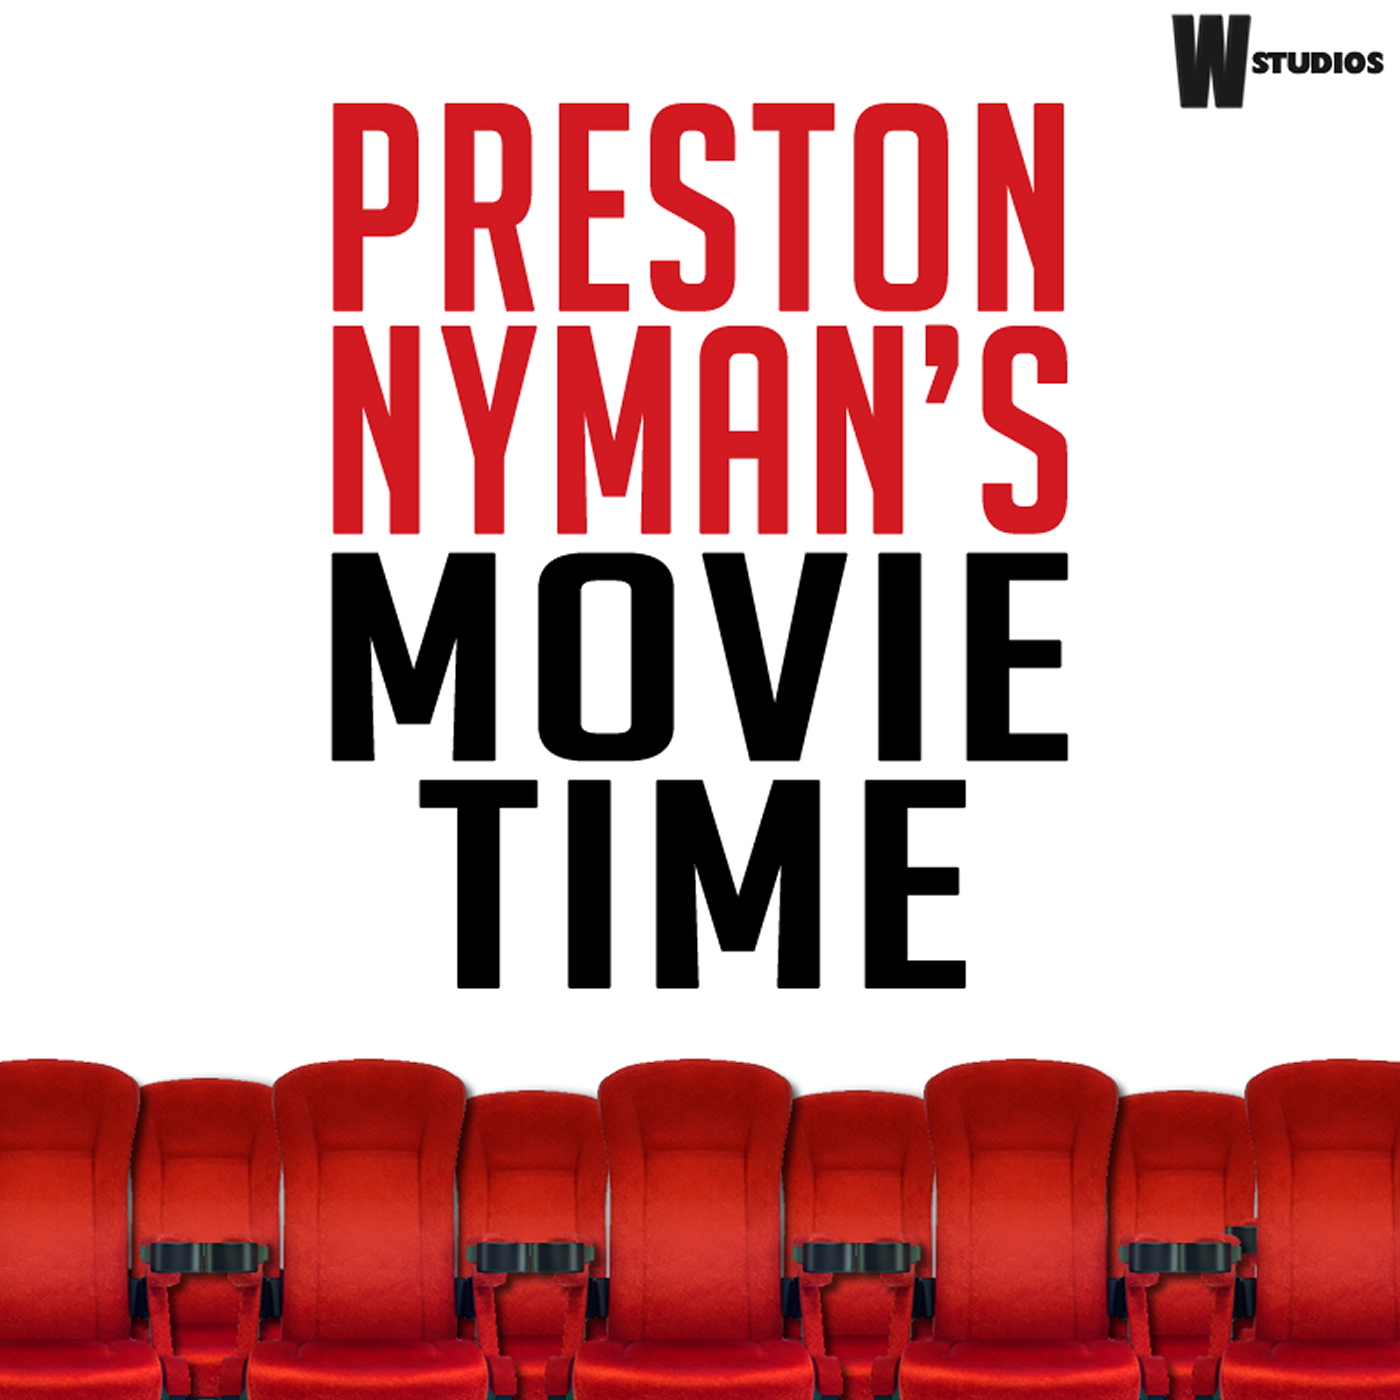 Preston Nyman's Movie Time